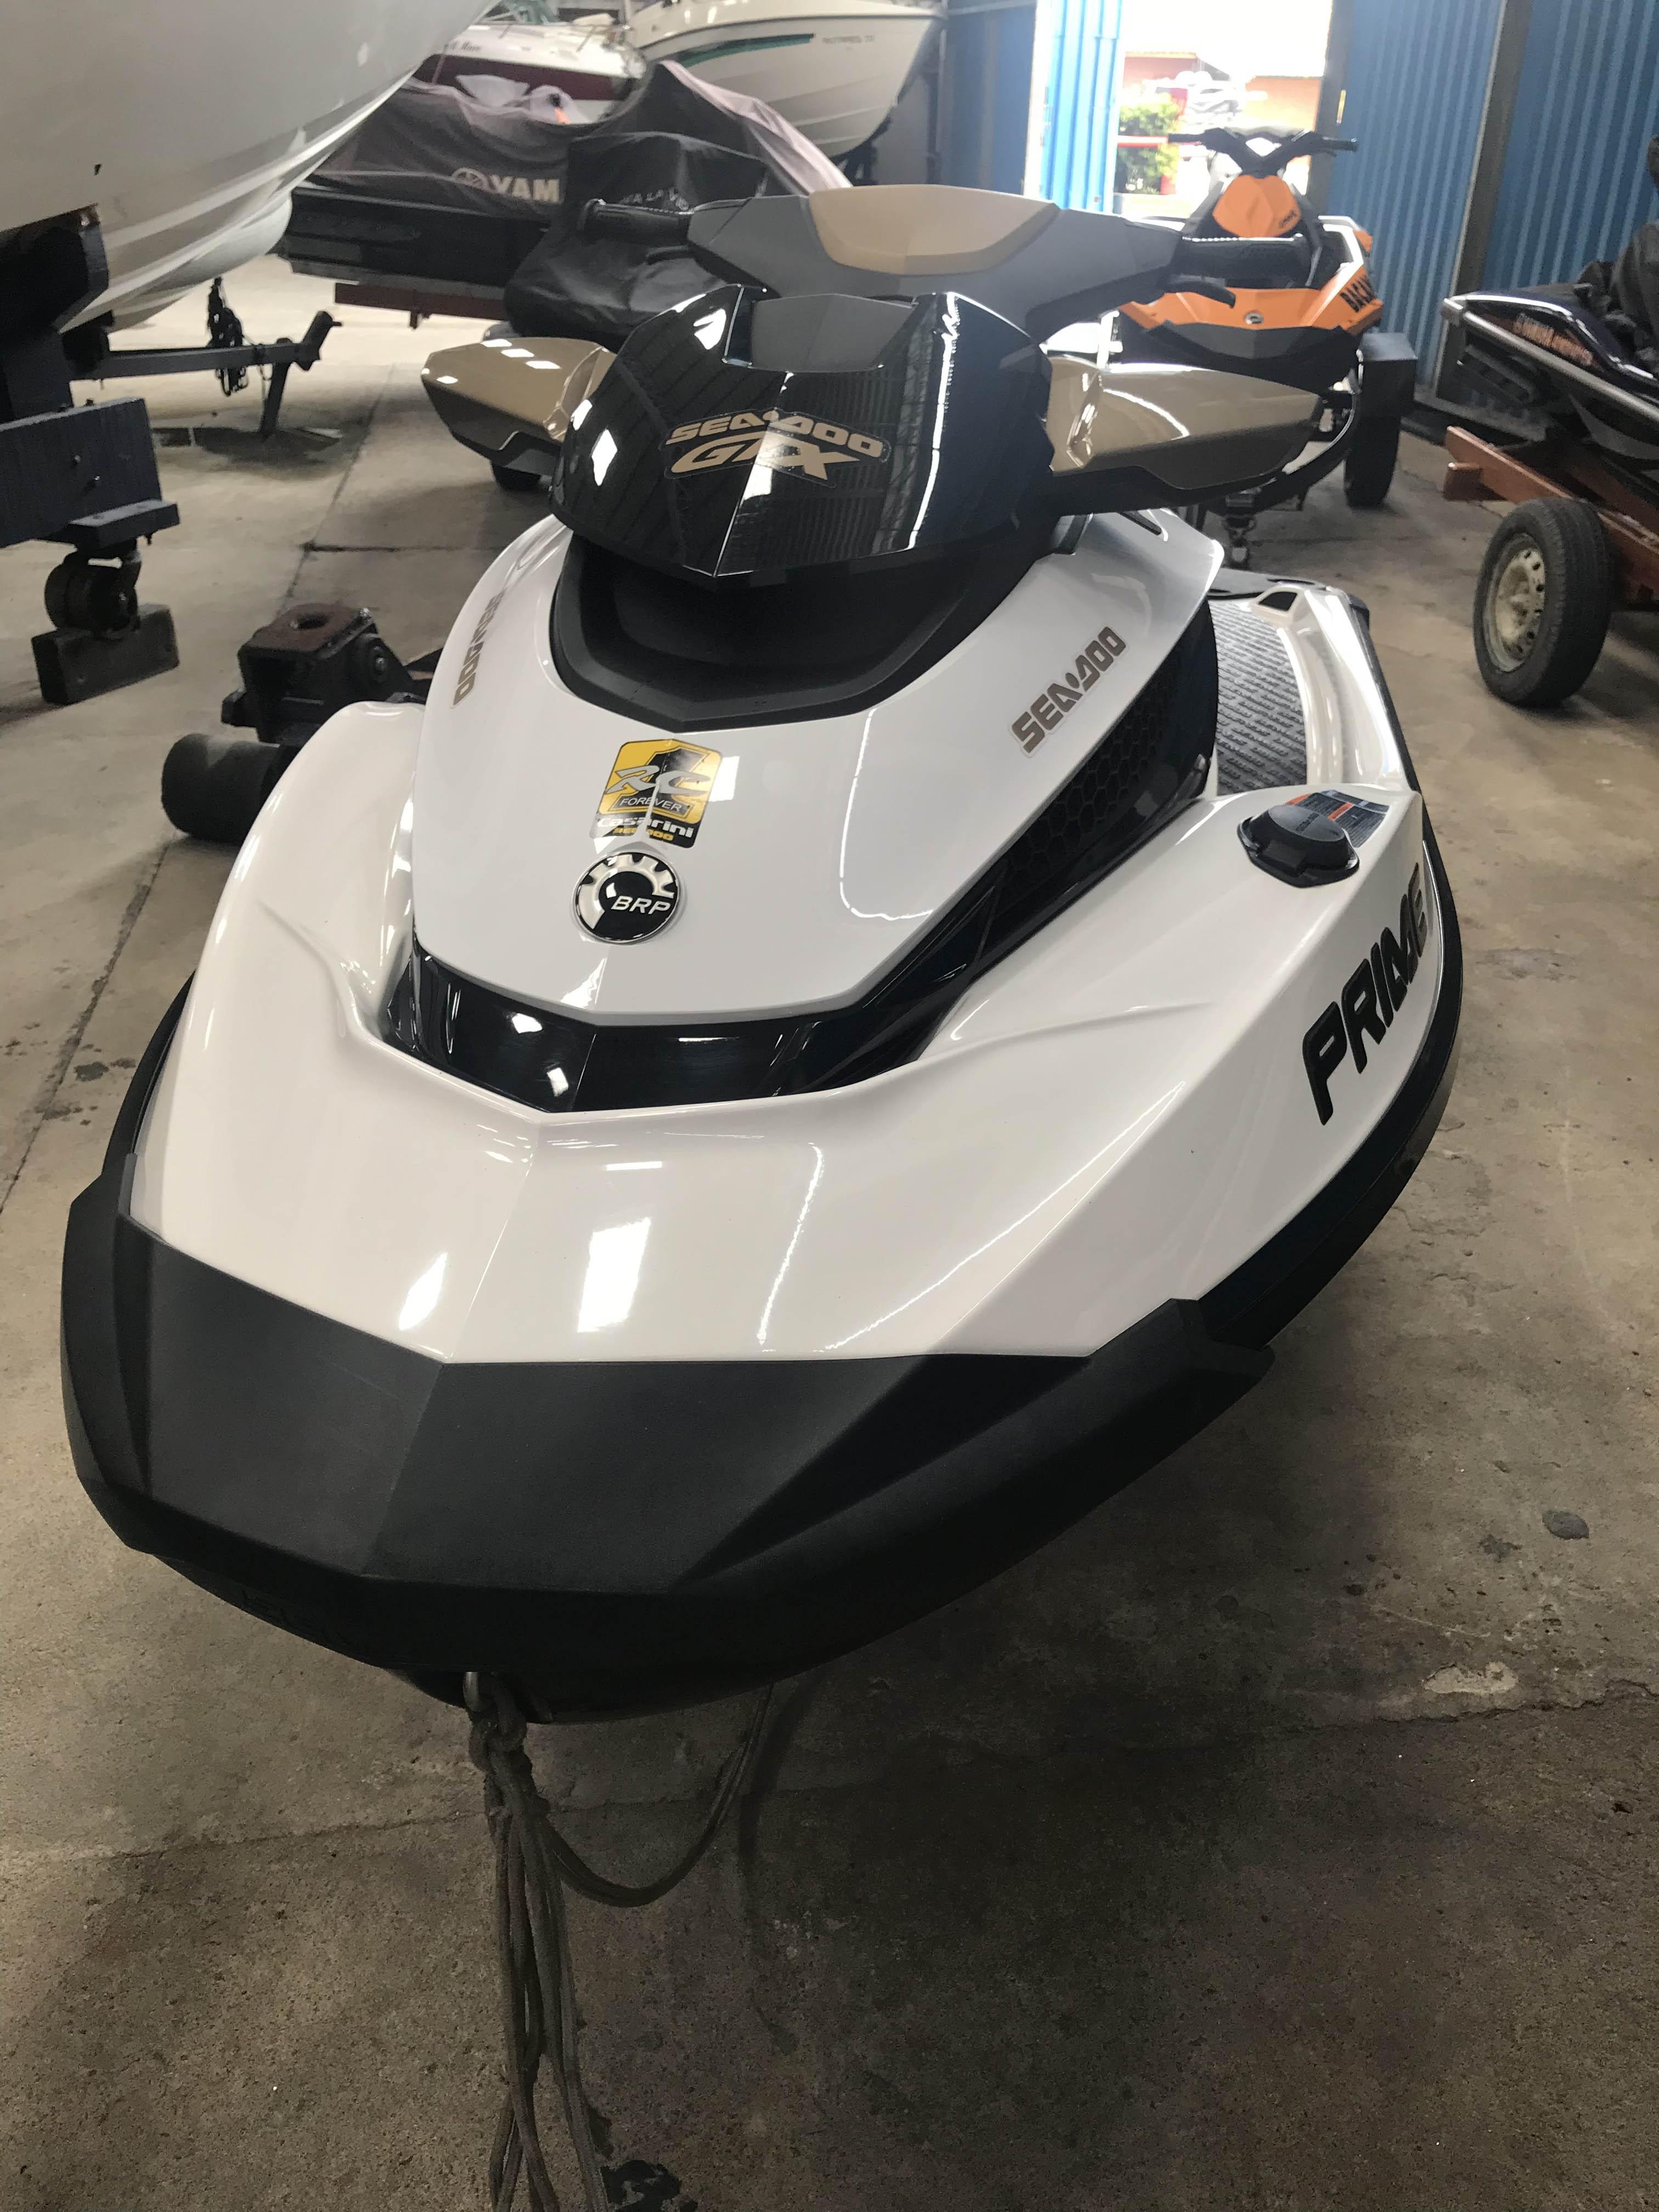 Sea Doo GTX 215